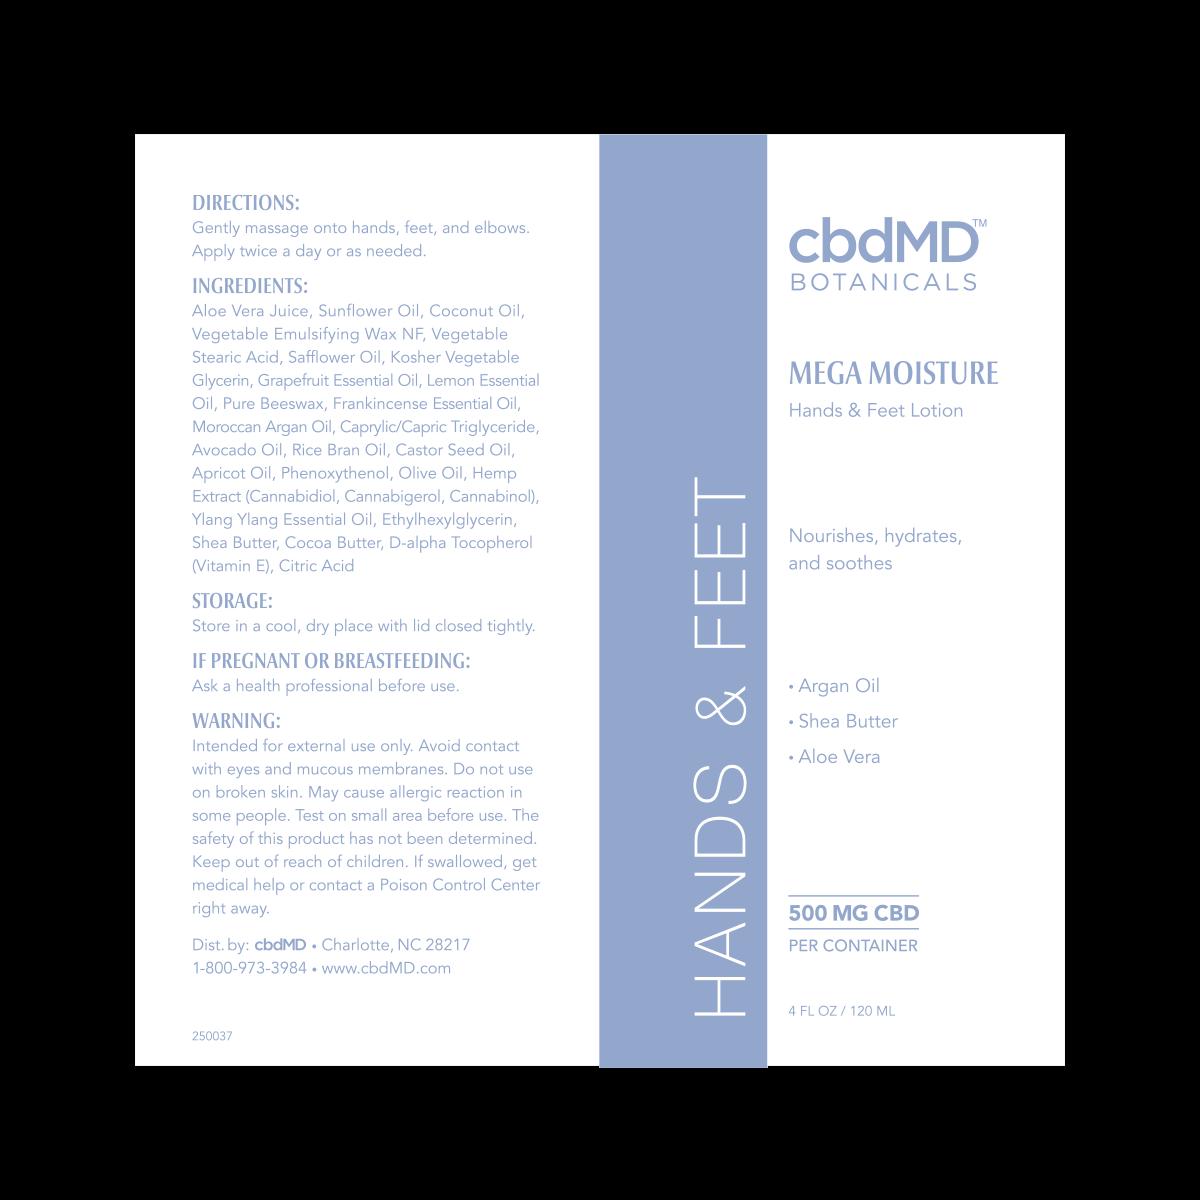 cbdMD | CBDmd | CBD 4 HANDS  & FEET  | 500mg | 4 Oz TUBE |